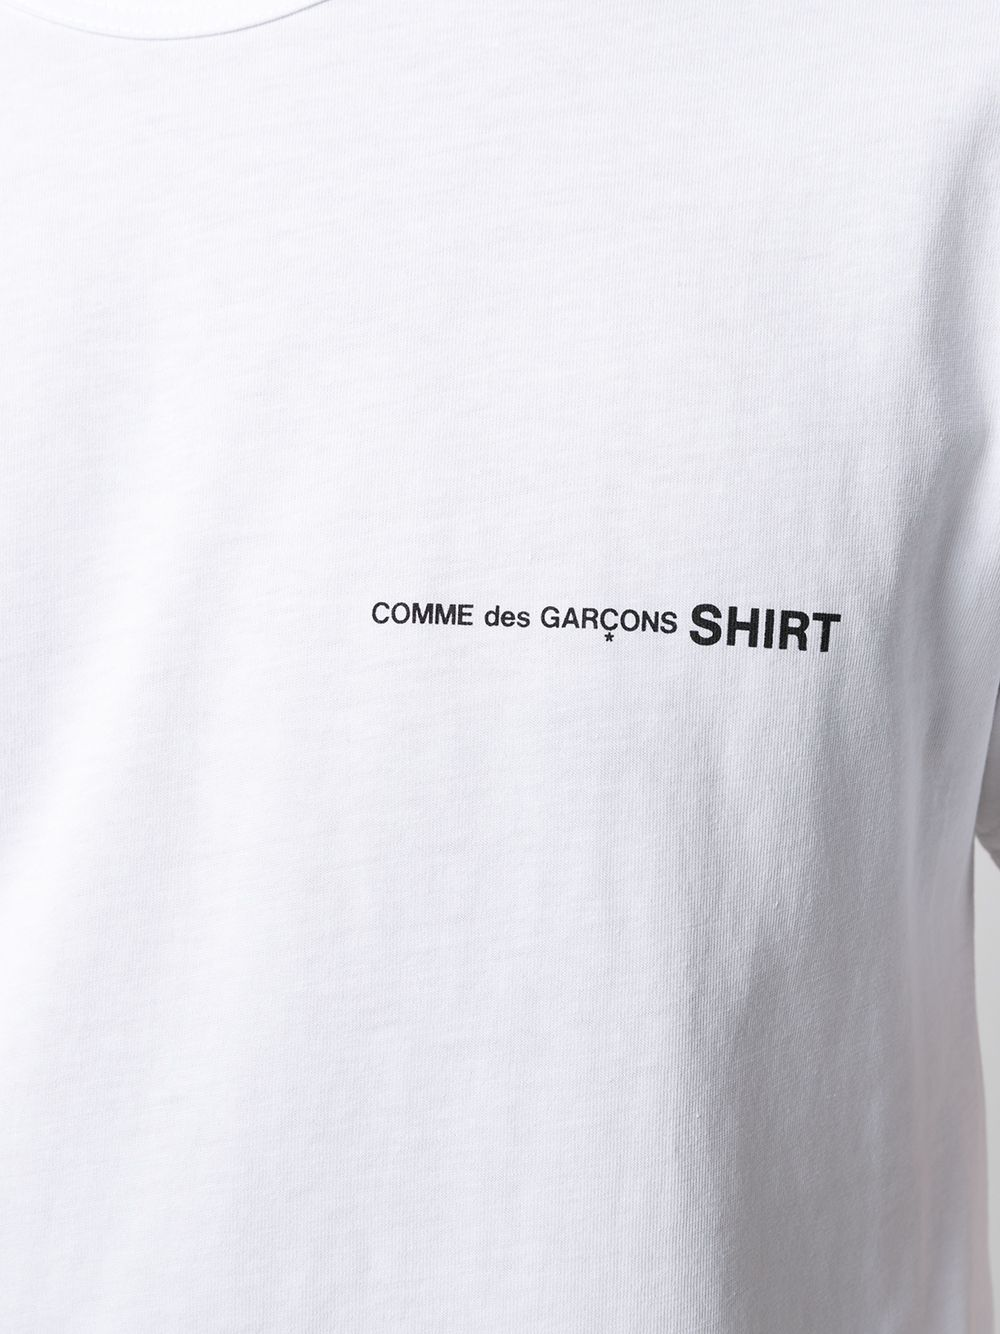 Comme des garçons printed logo t-shirt man COMME DES GARÇONS SHIRT | T-shirts | FG-T018WHITE